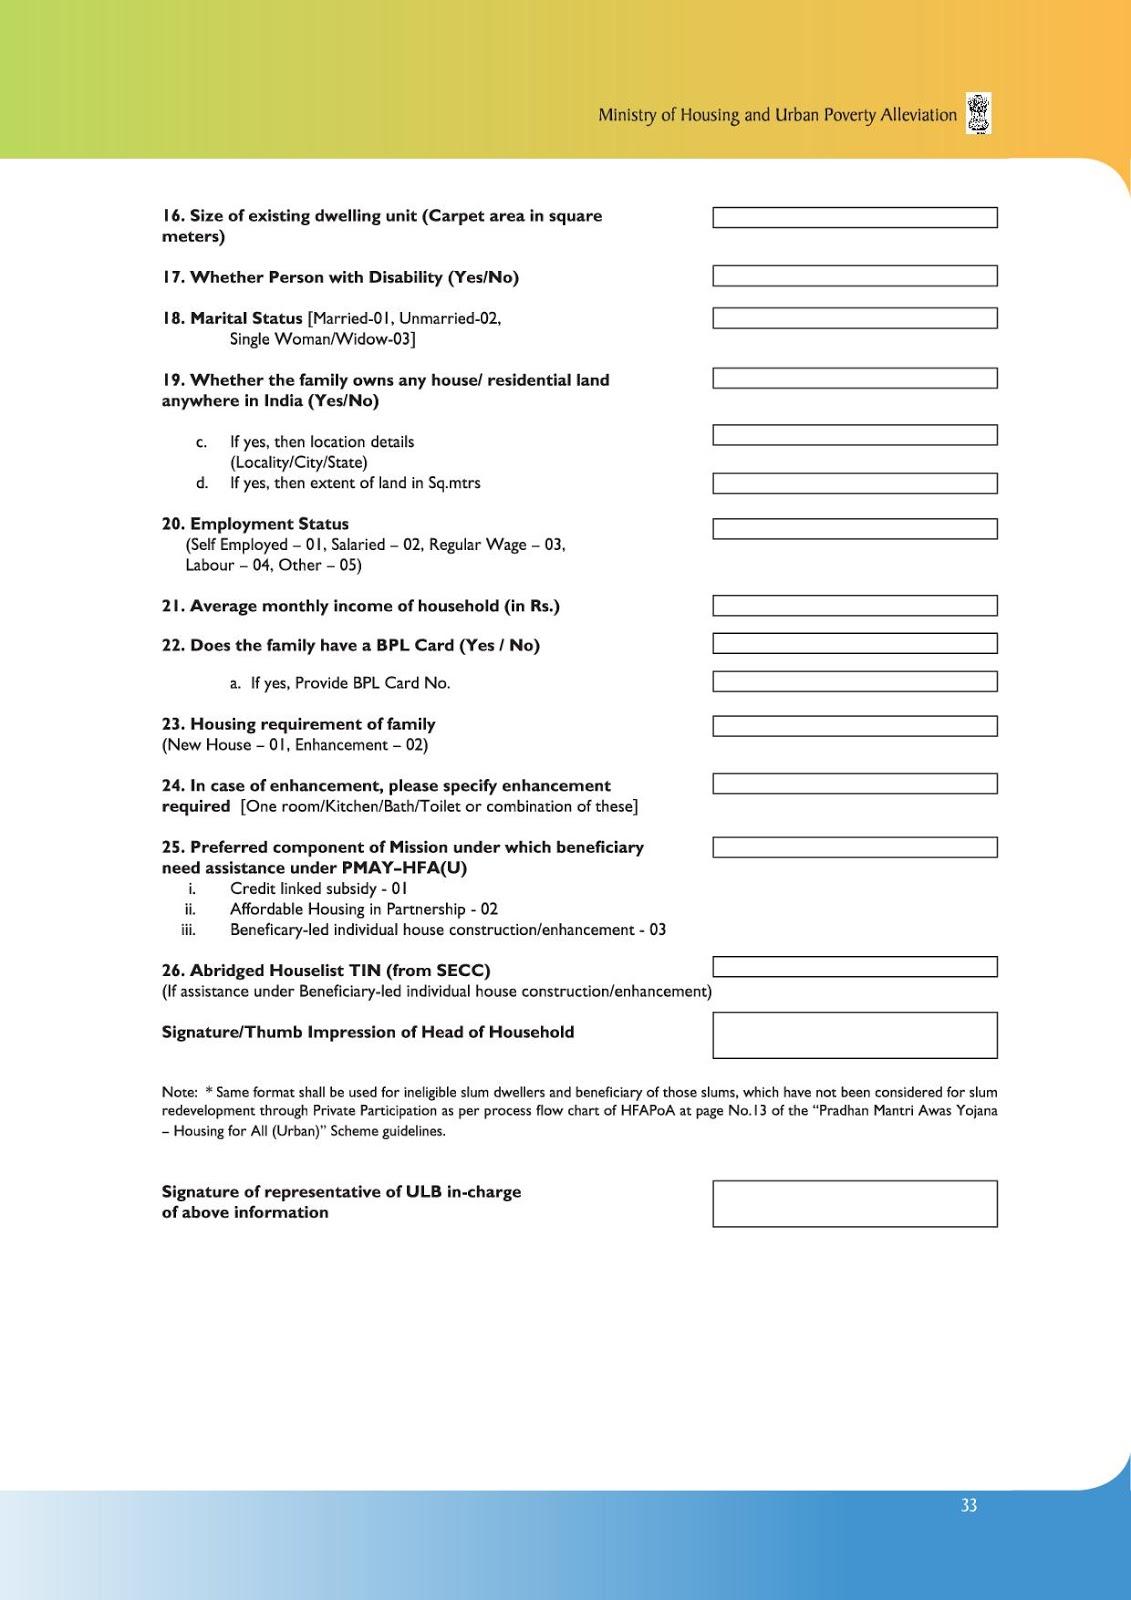 PM Awas Yojana Application Form ~ Prime Minister's Schemes